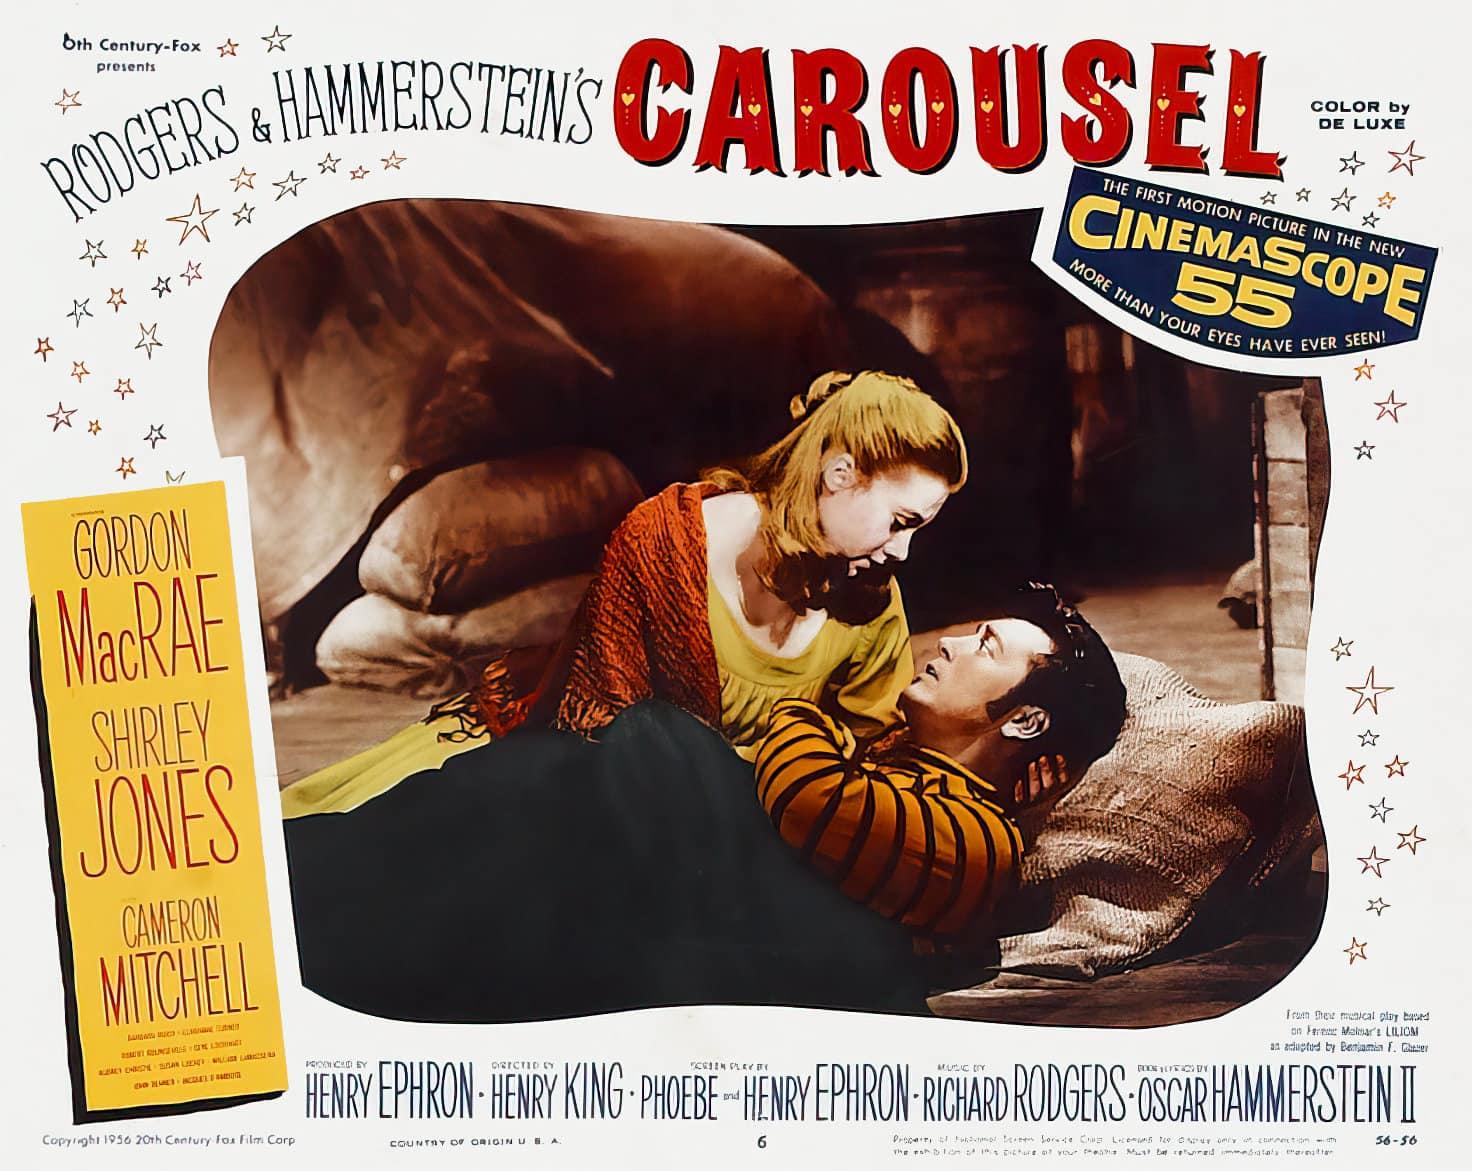 Vintage Carousel movie lobby card (1956)